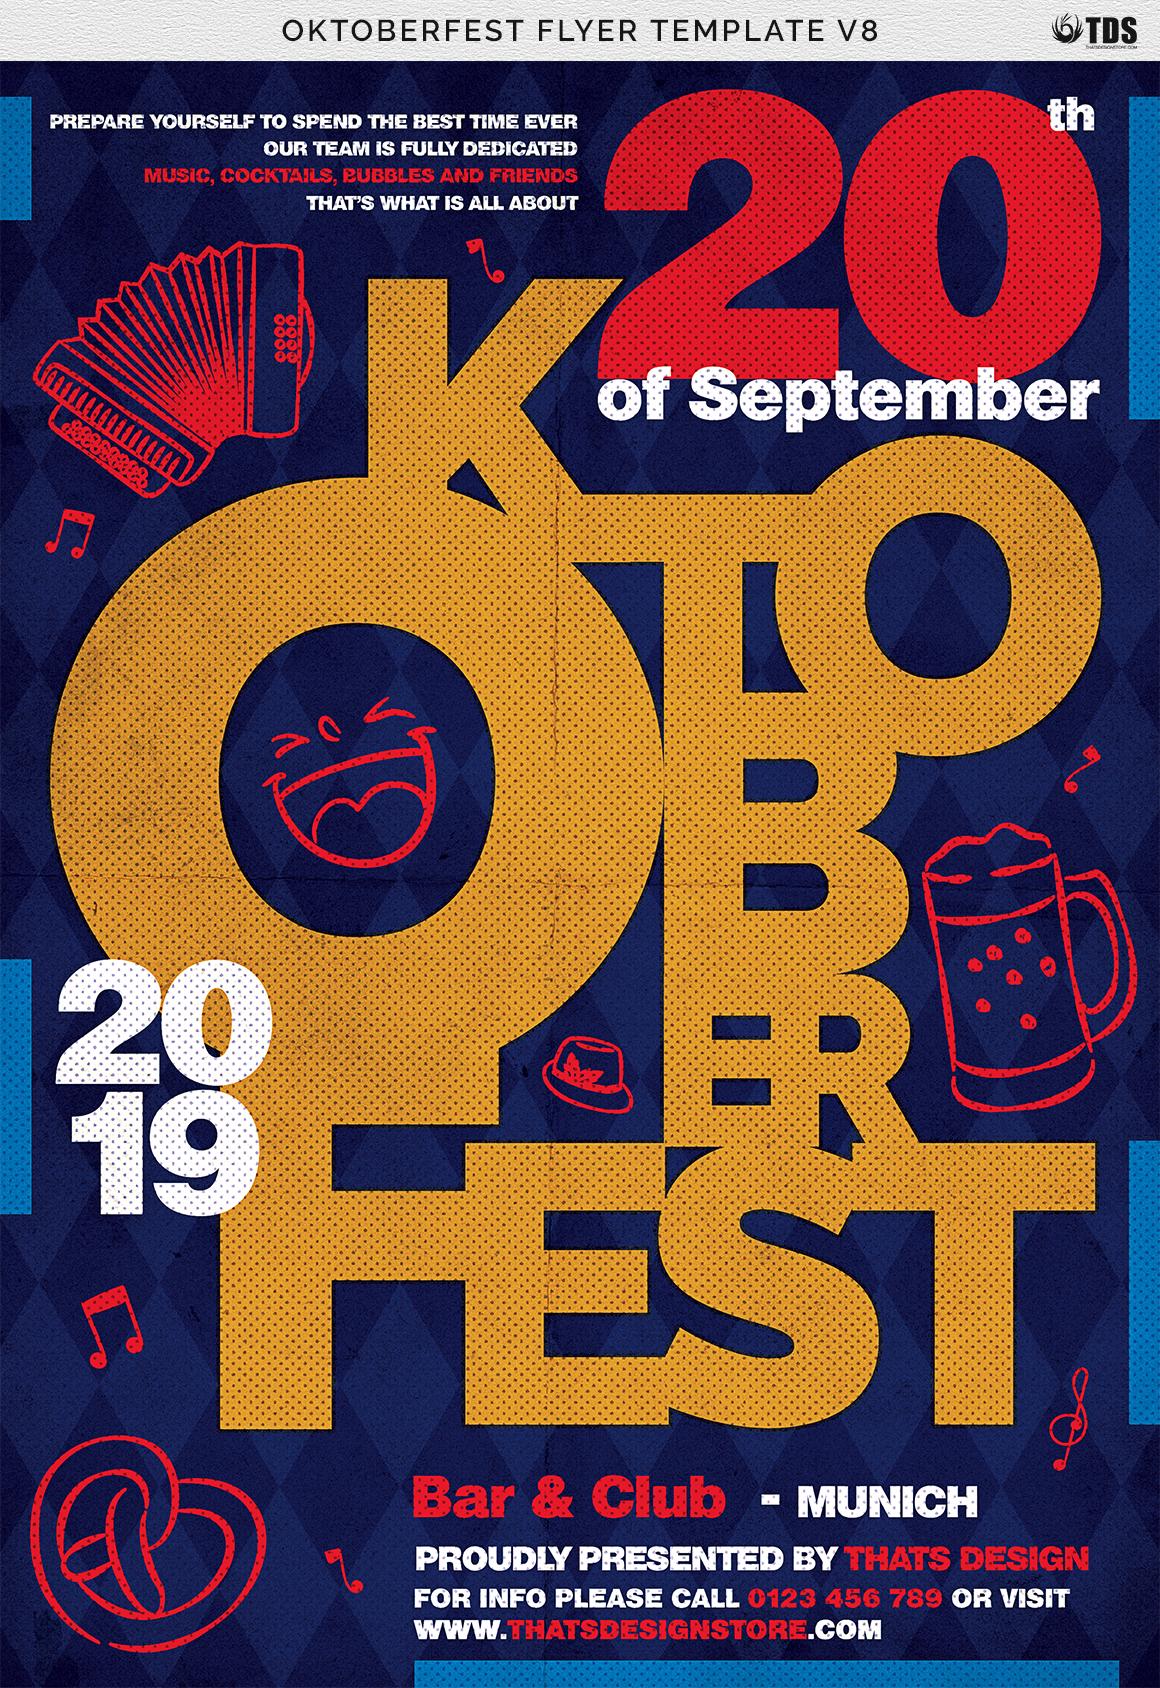 Oktoberfest flyer template V8 example image 8